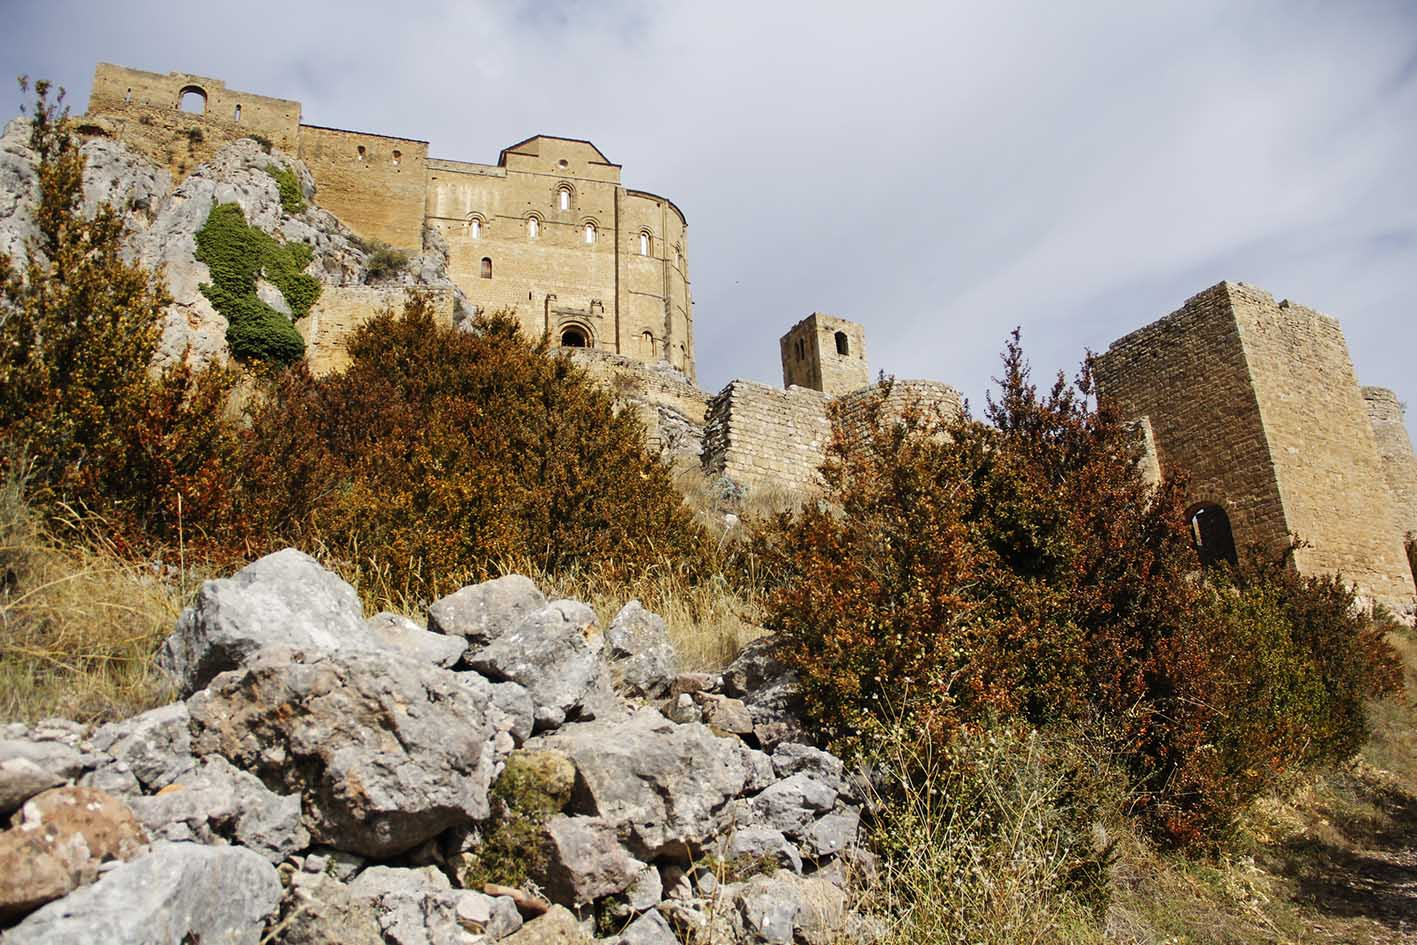 Vista de la muralla del Castillo de Loarre